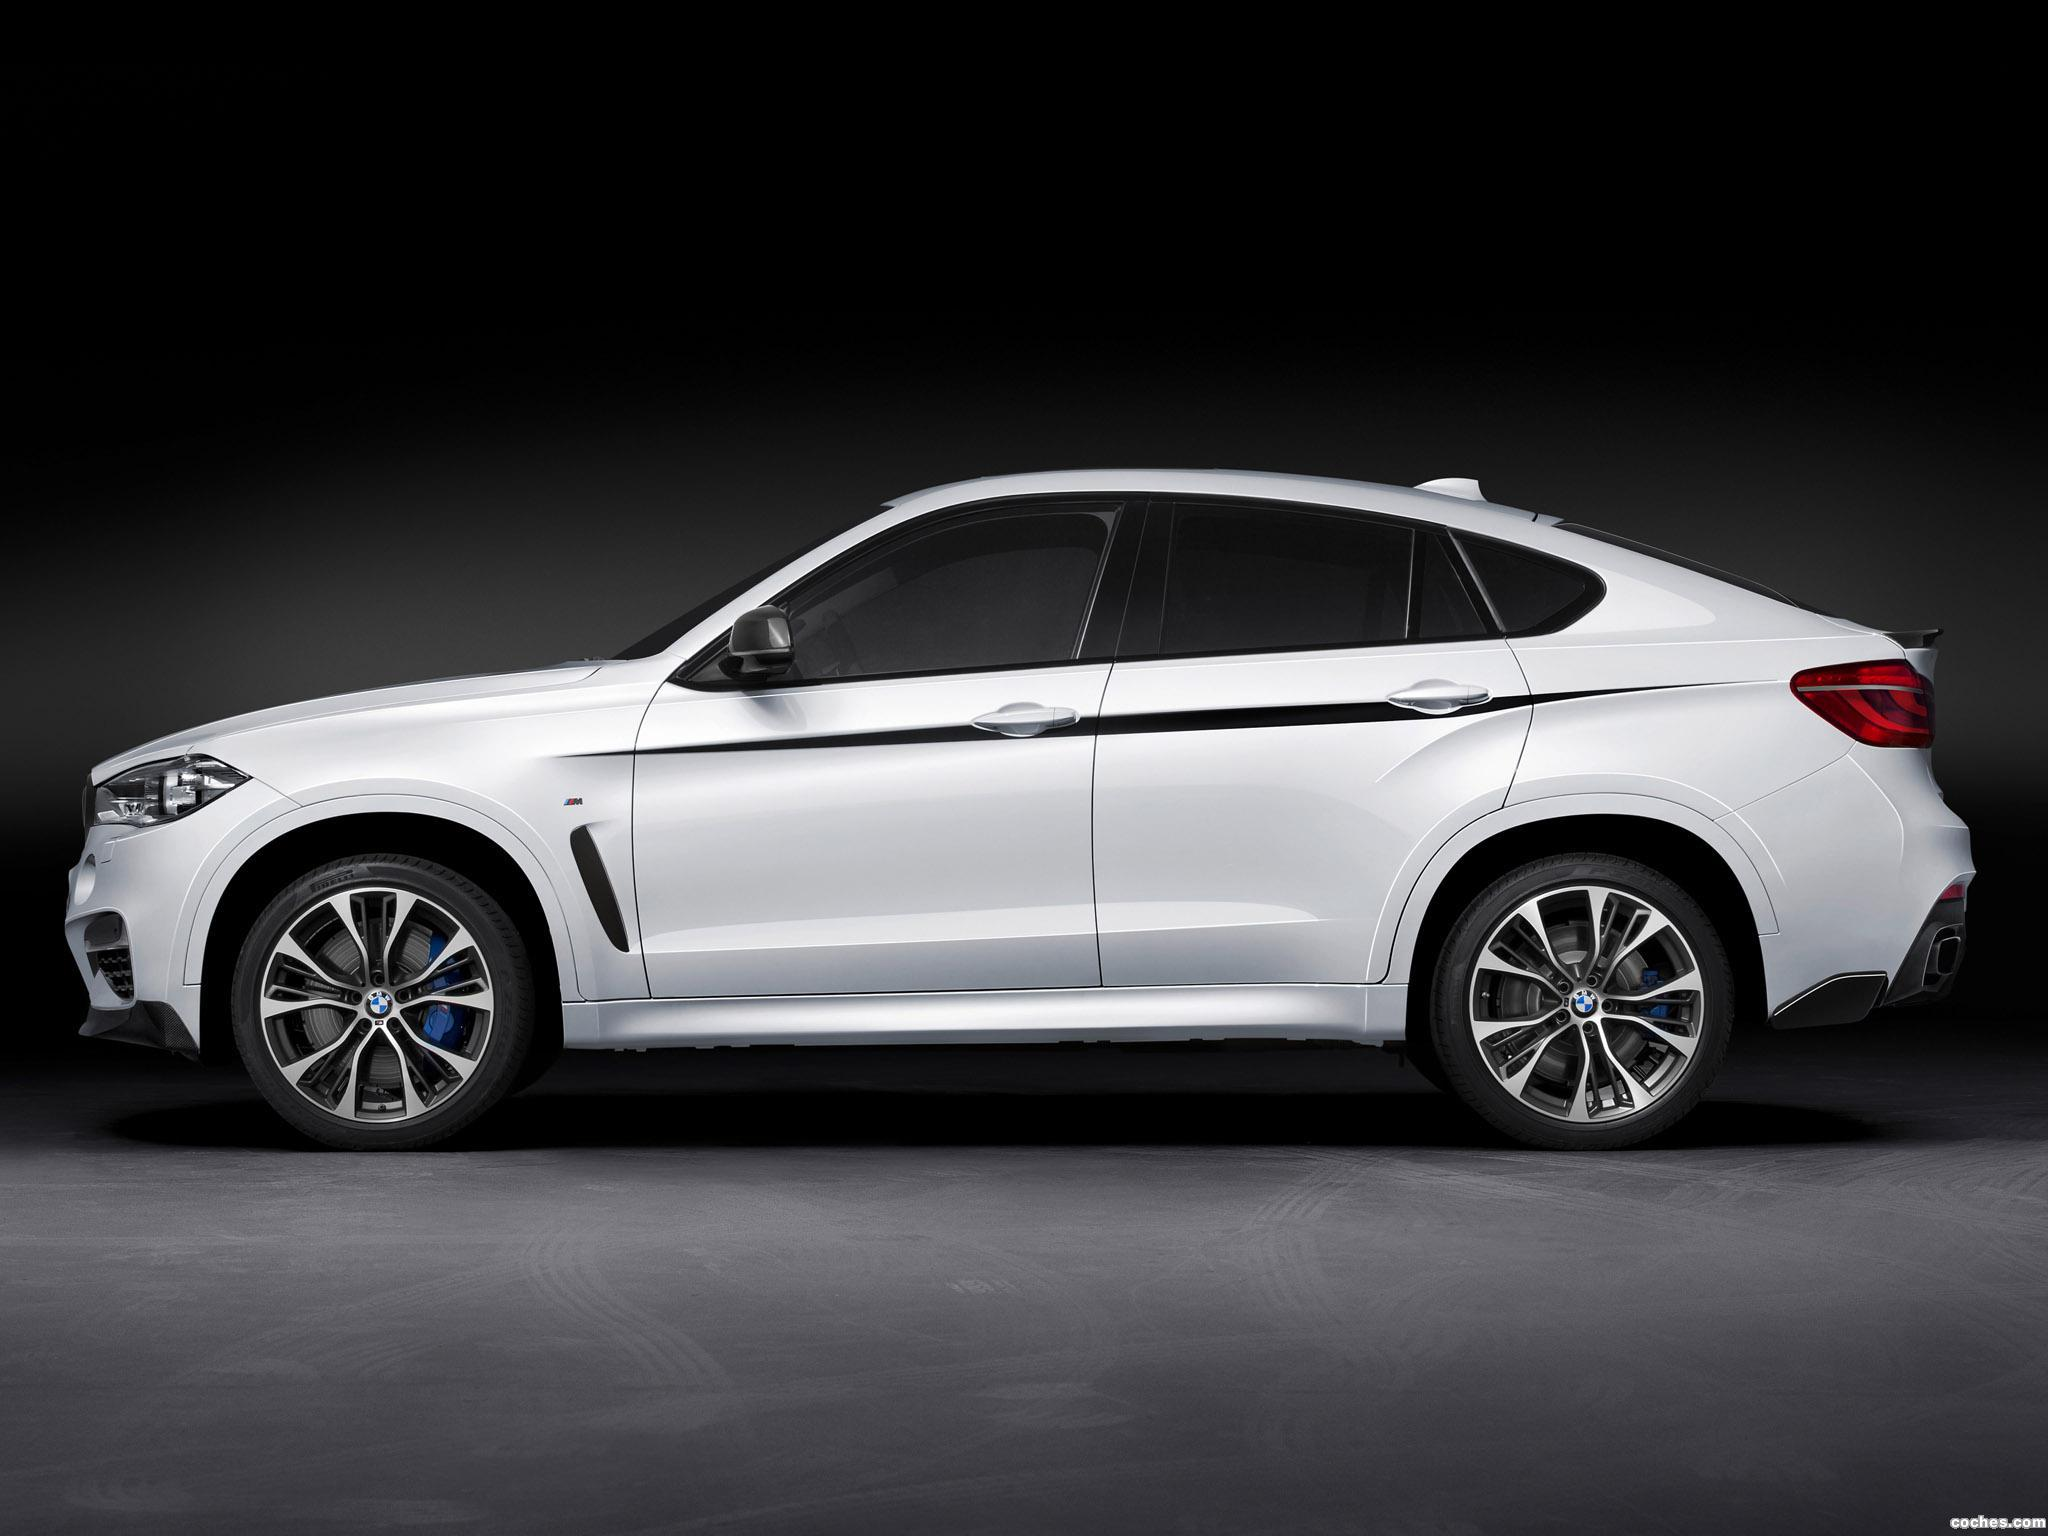 Foto 3 de BMW X6 M50d M Performance Accessories F16 2014